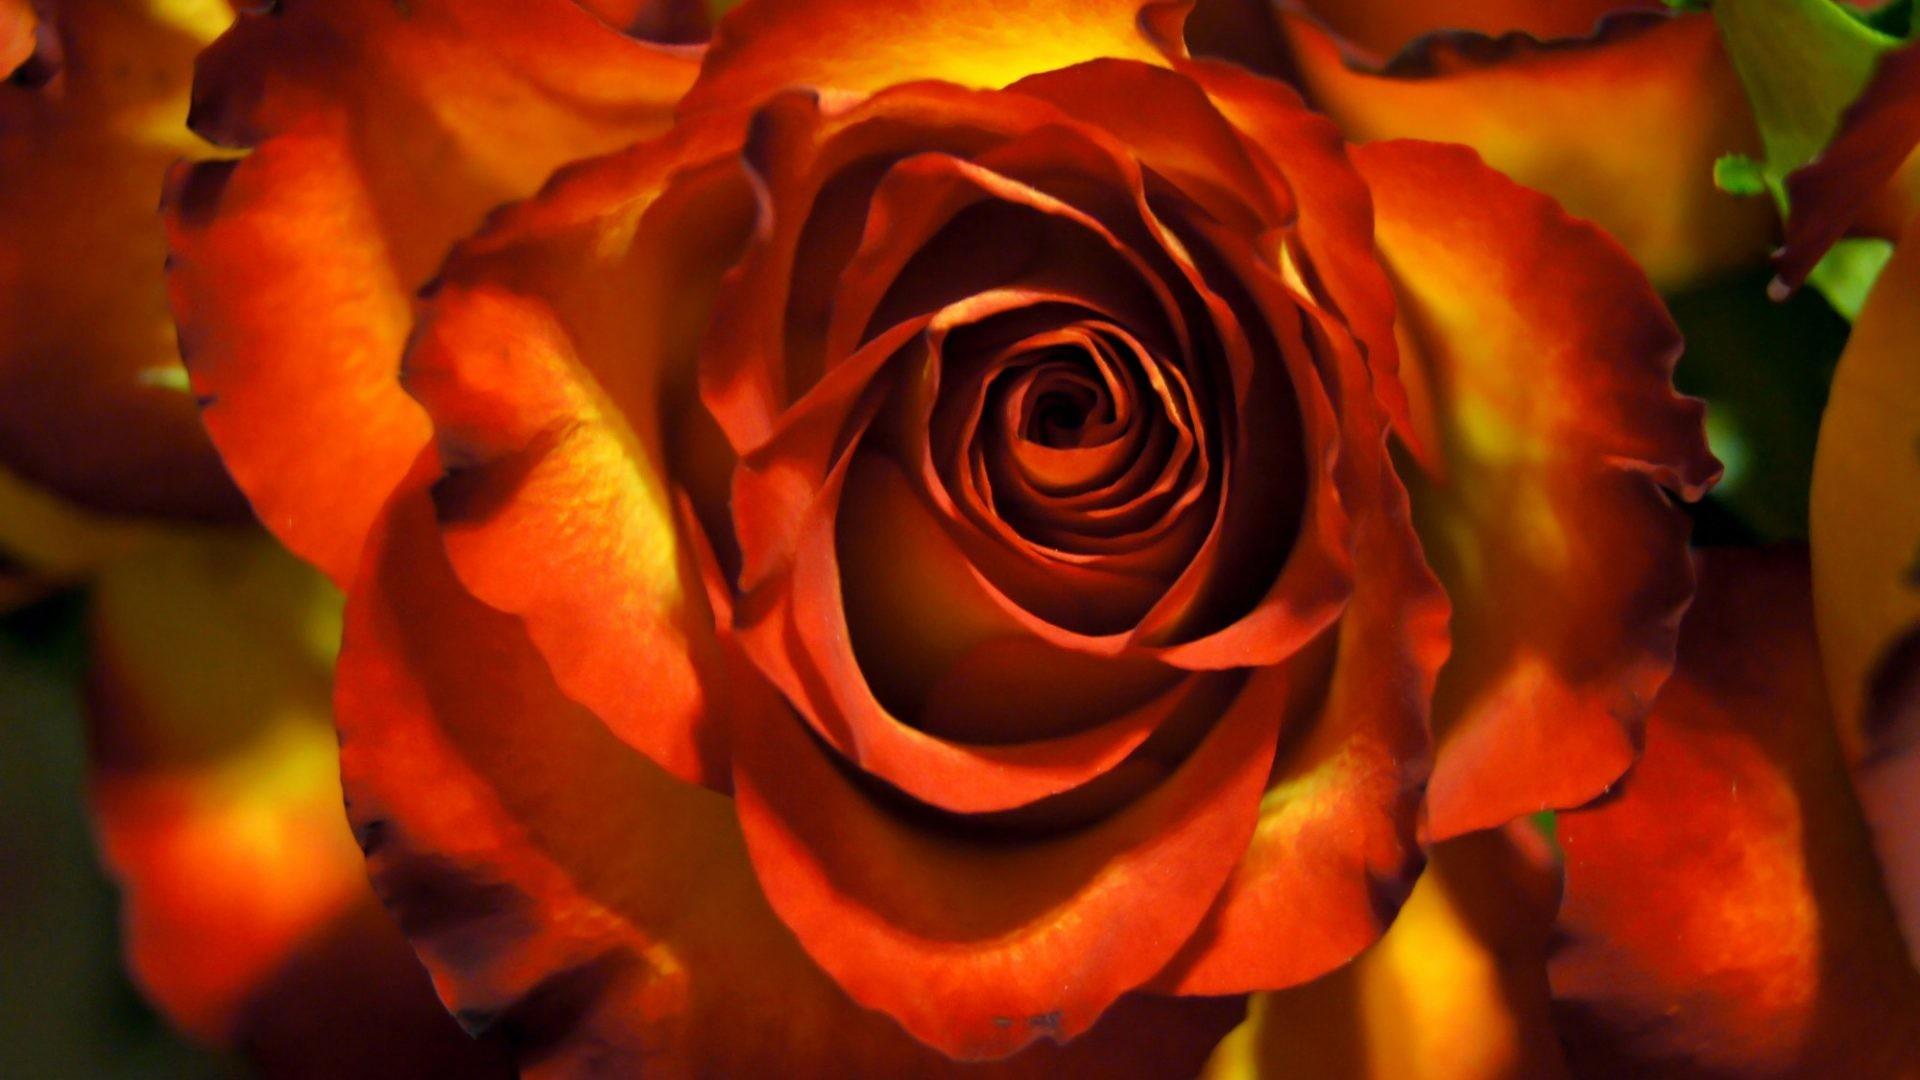 Bronze Tag – Rose Flower Golden Beautiful Orange Nature Bronze Lovely  Petals Single Desktop Wallpaper for